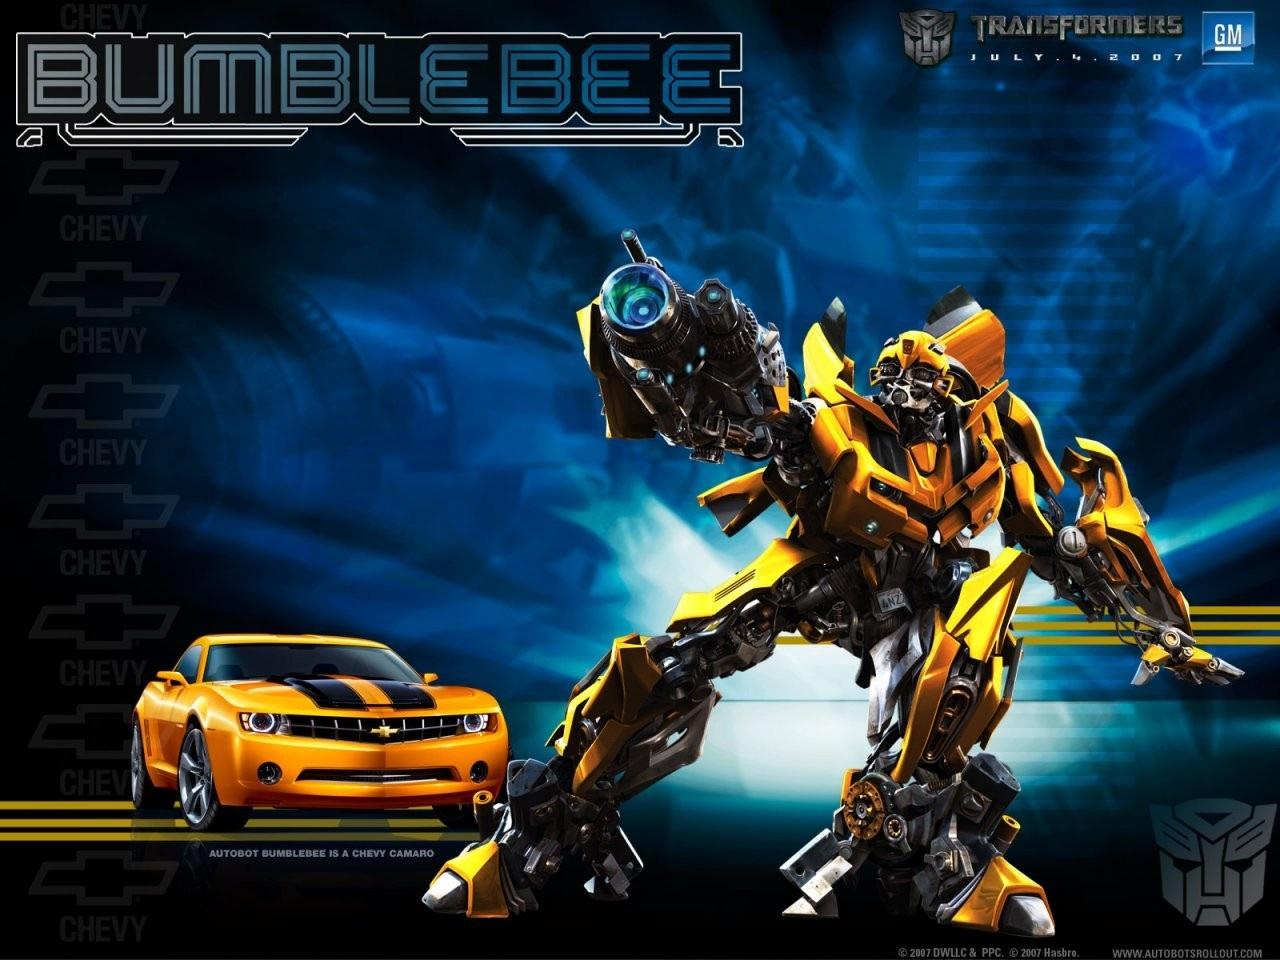 Download Transformers Wallpaper Desktop For Desktop 1280x960